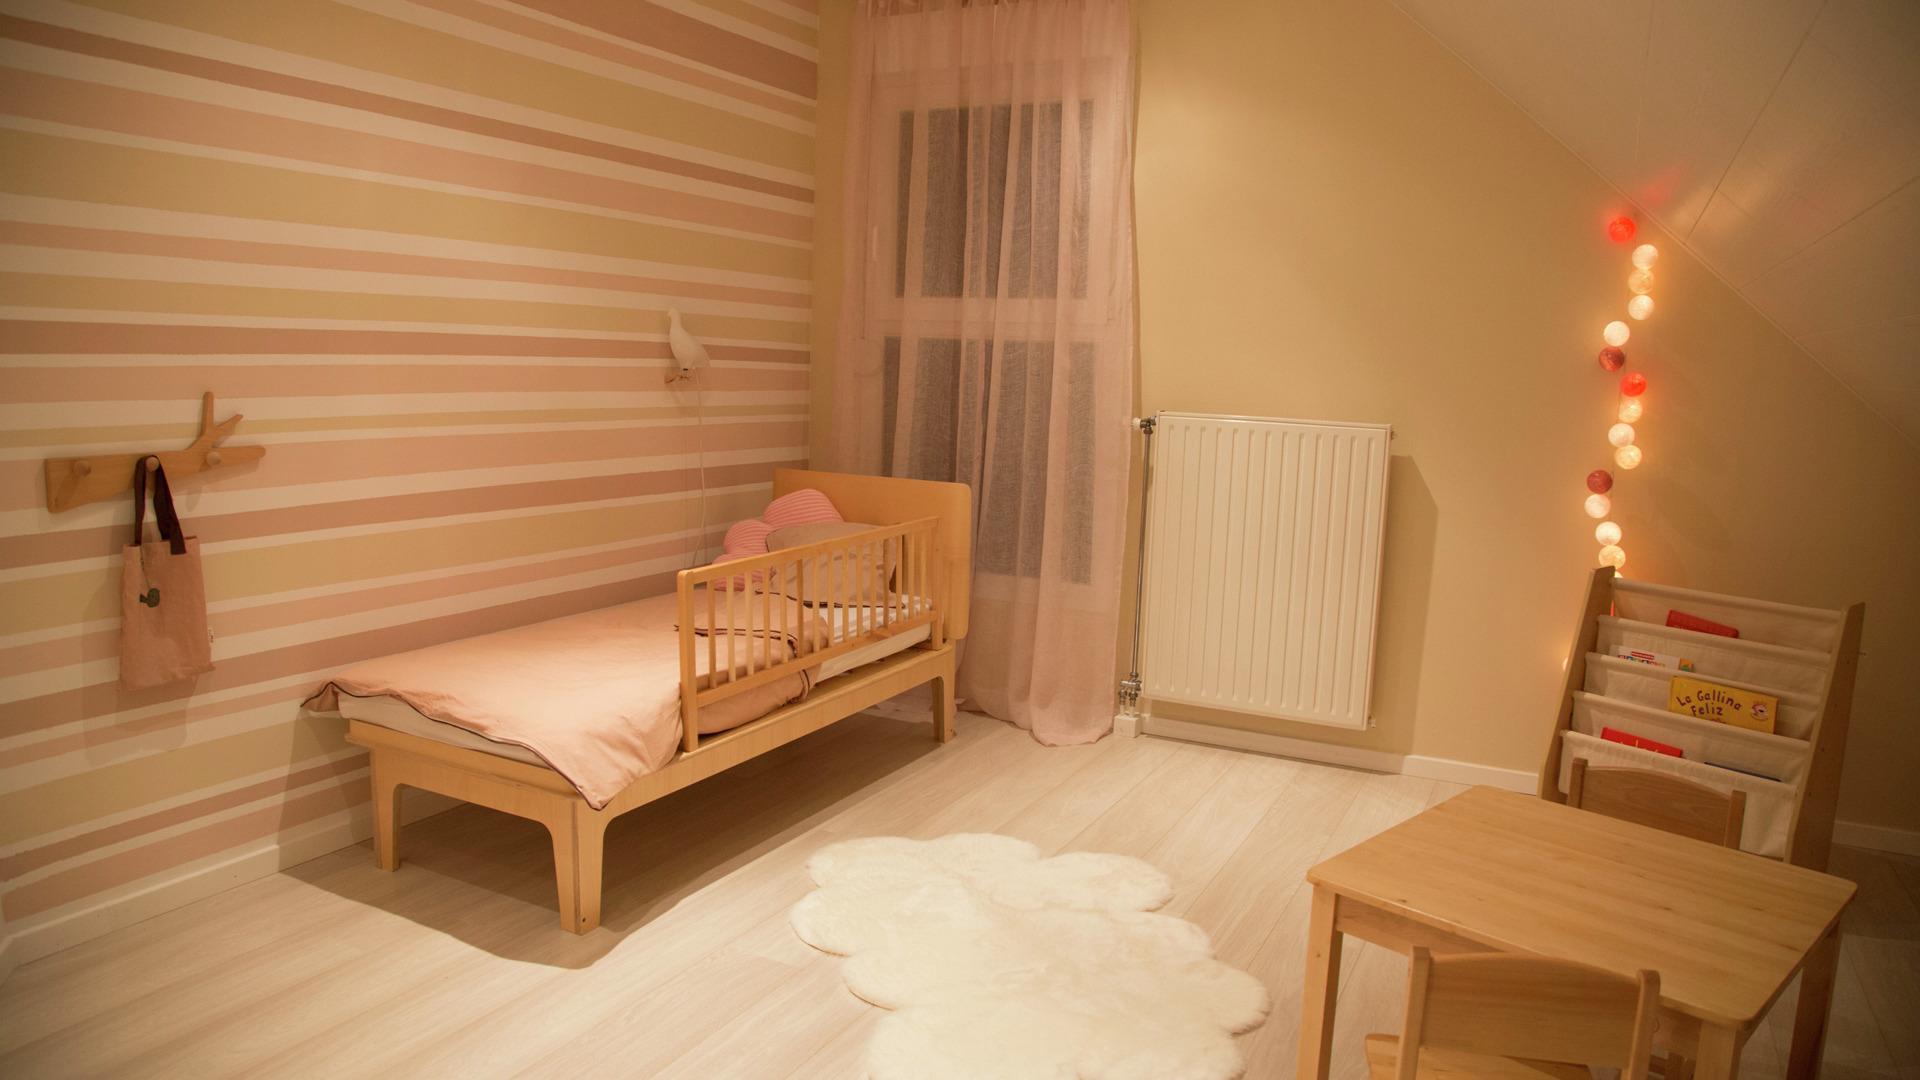 Chambre Moderne Pastel. Dcoration Chambre Moderne Collection De ...